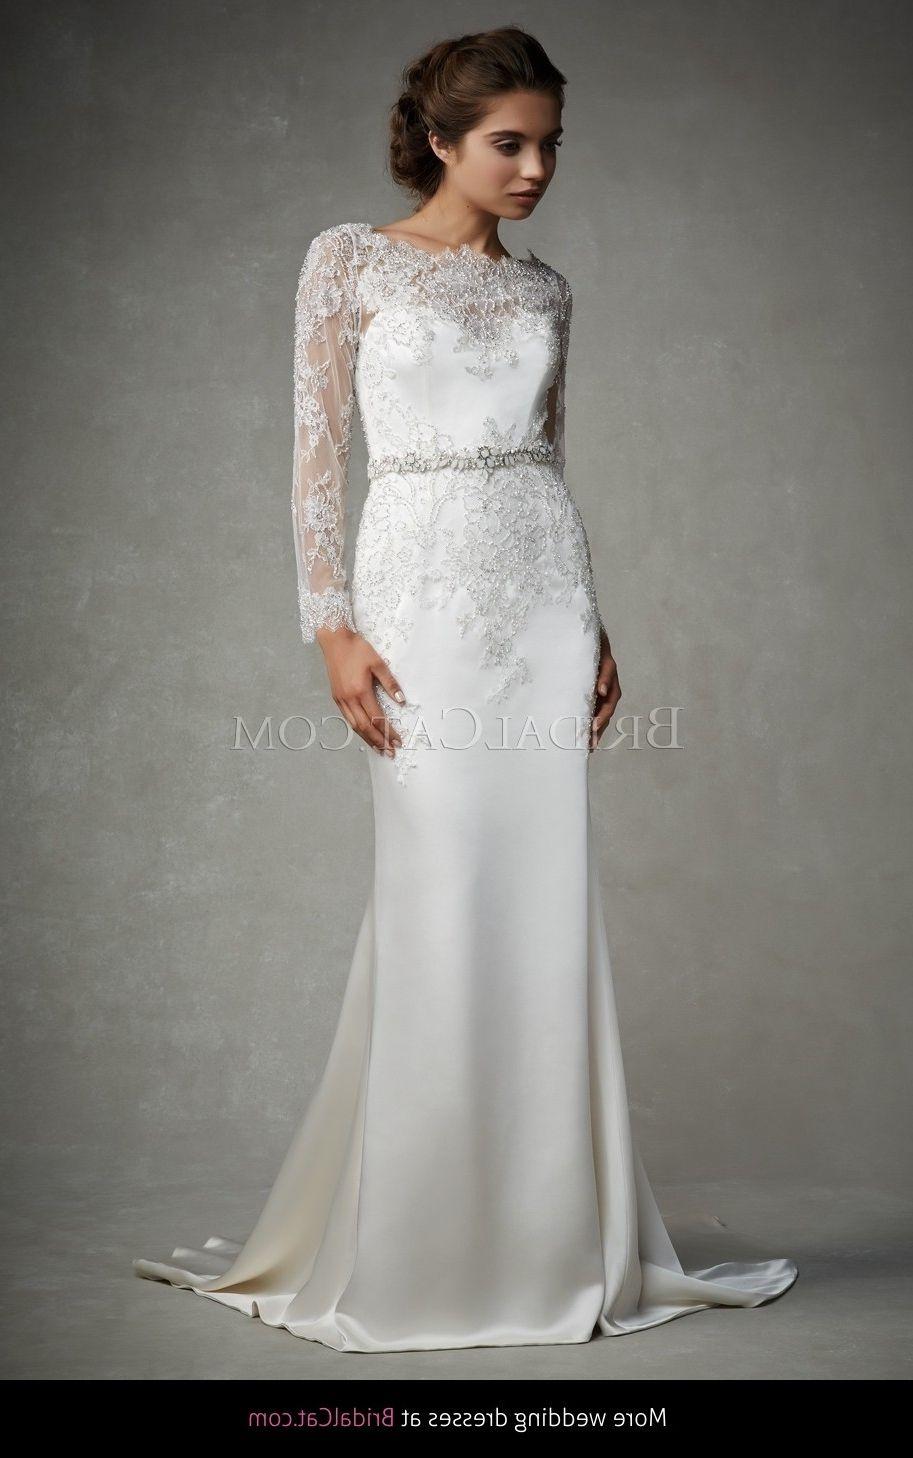 Long Sleeve Lace Wedding Dress Glasgow Wedding Dress Pinterest